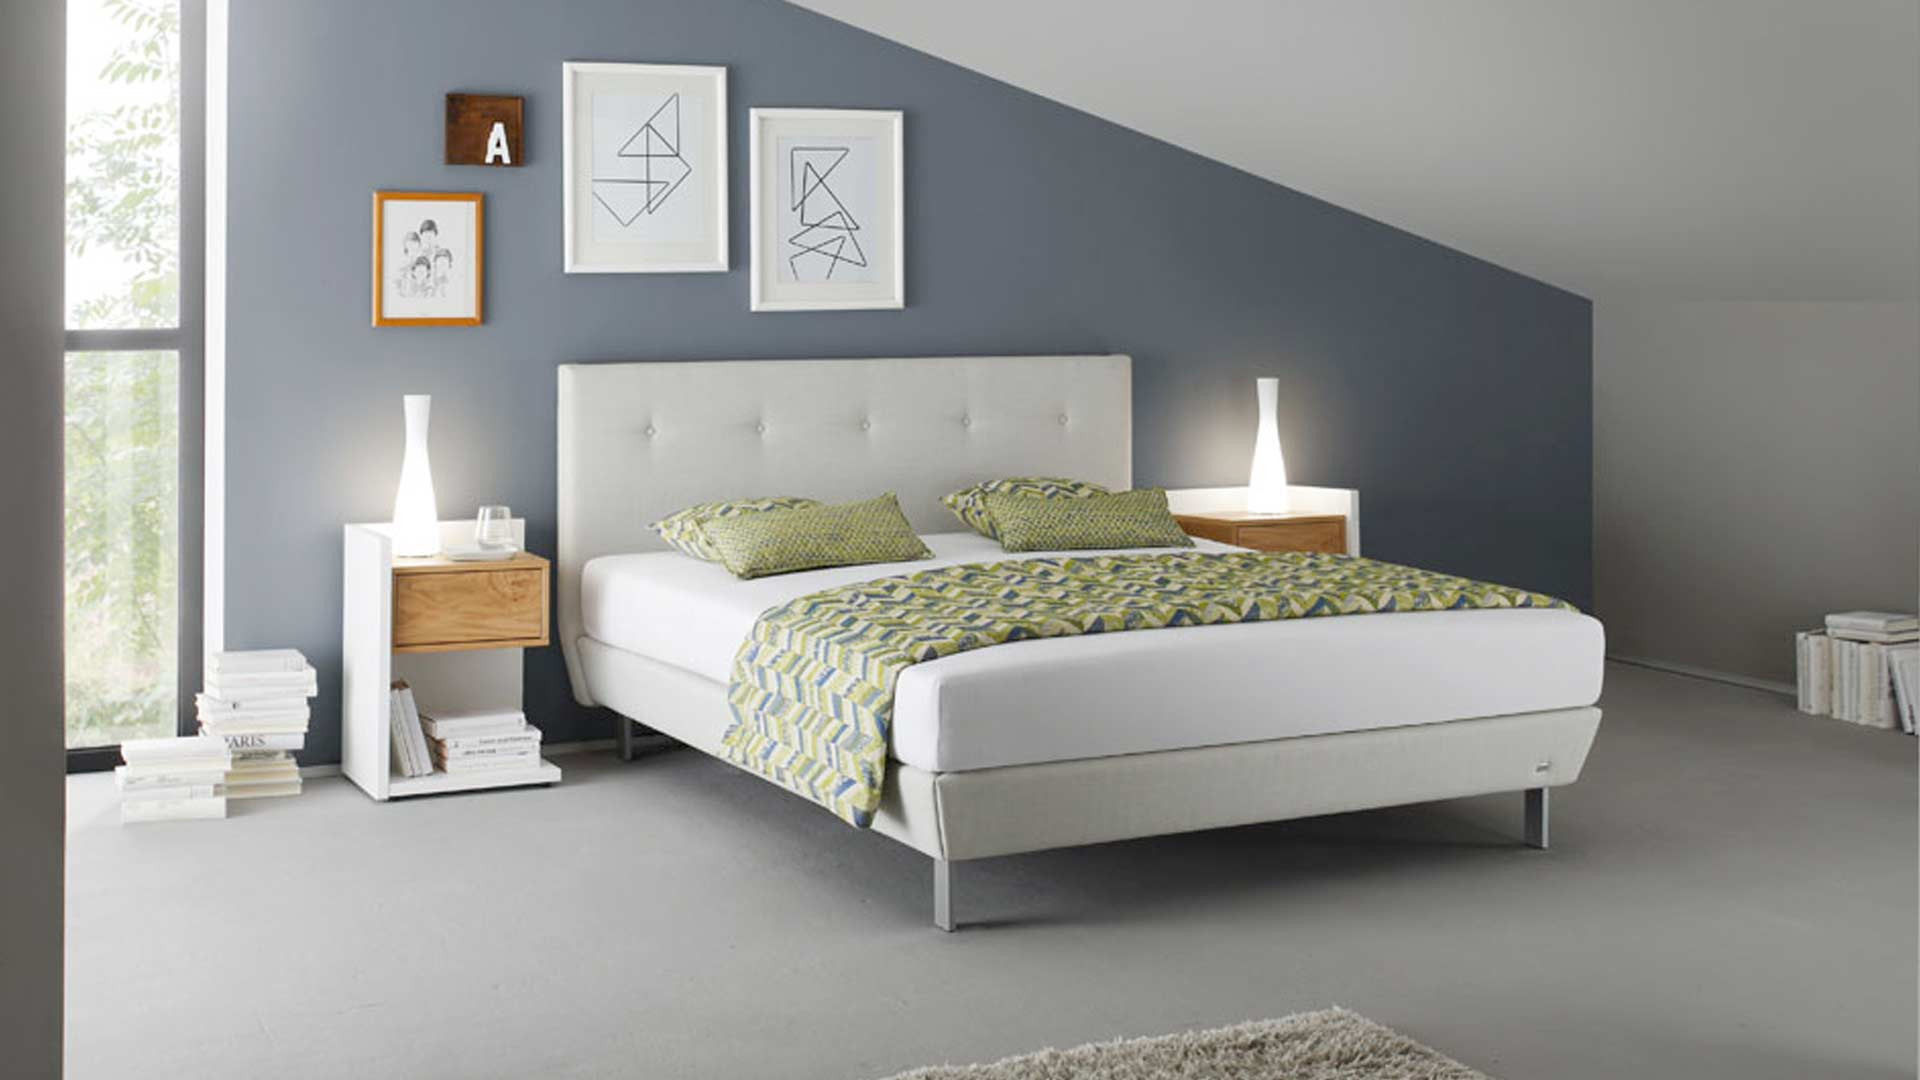 ostermann betten elegant details with ostermann betten. Black Bedroom Furniture Sets. Home Design Ideas